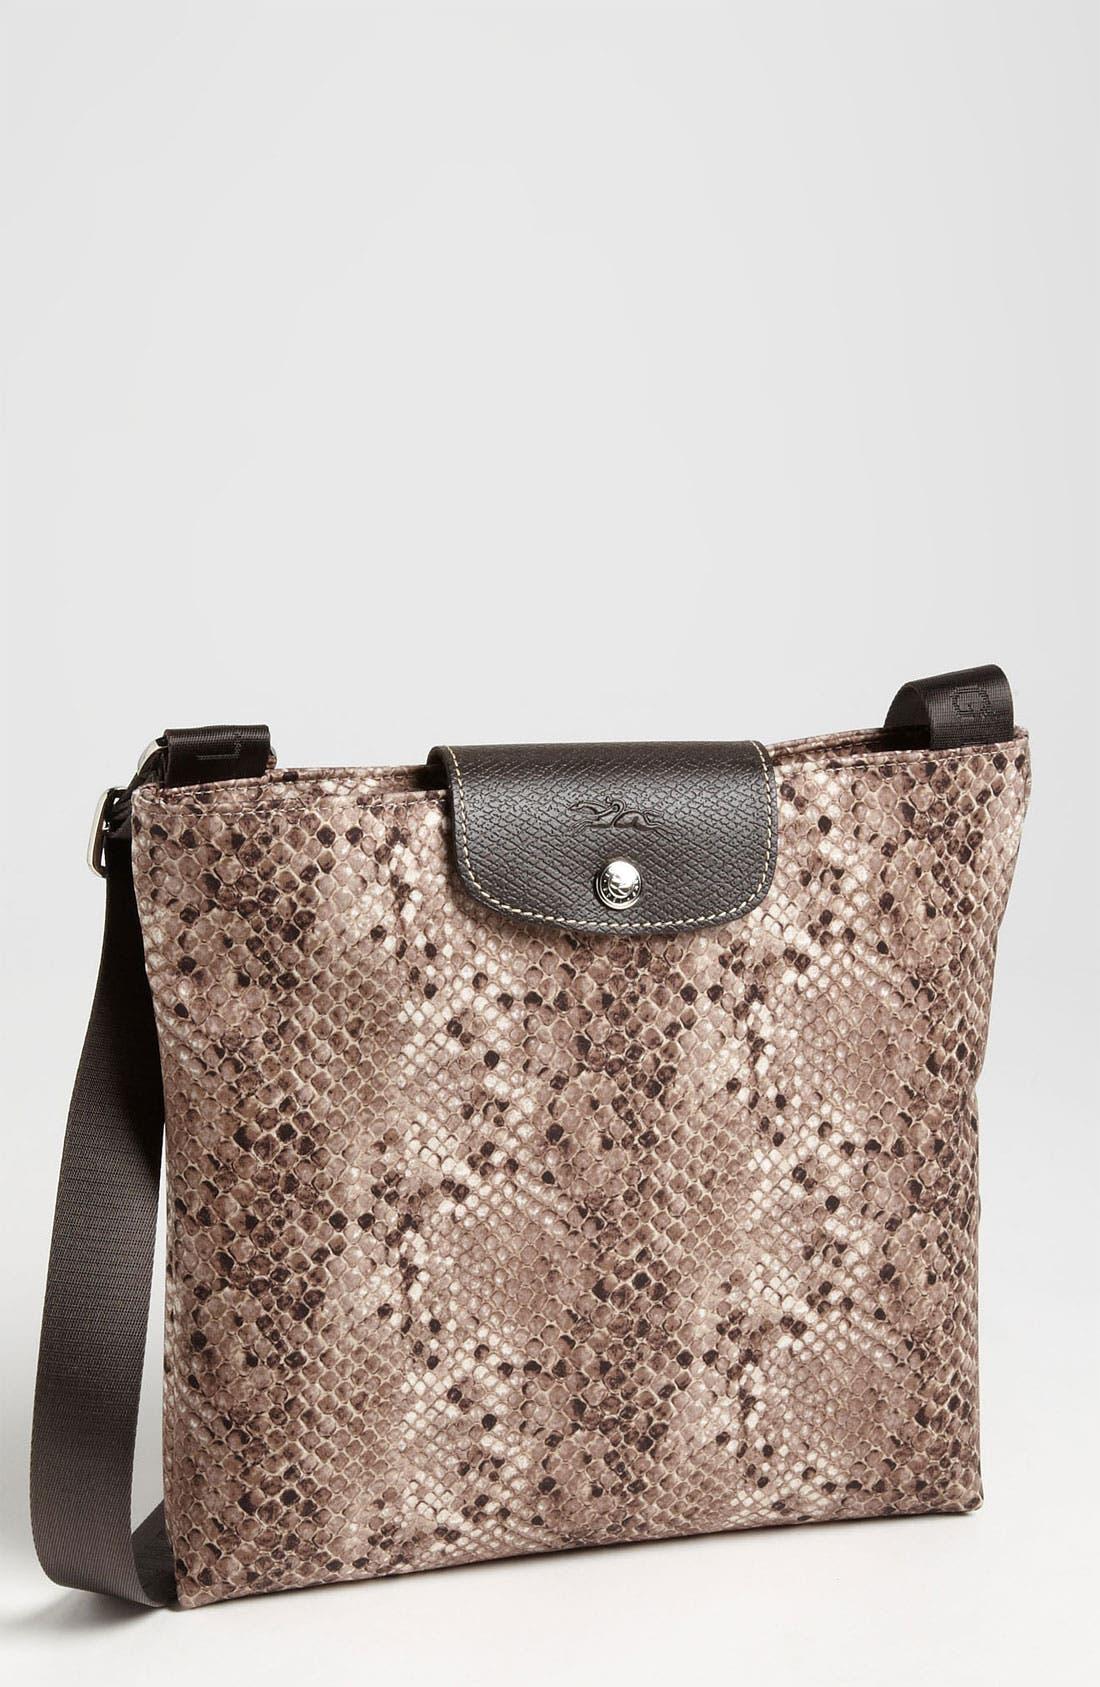 'Le Pliage' Python Print Crossbody Bag,                             Main thumbnail 1, color,                             266